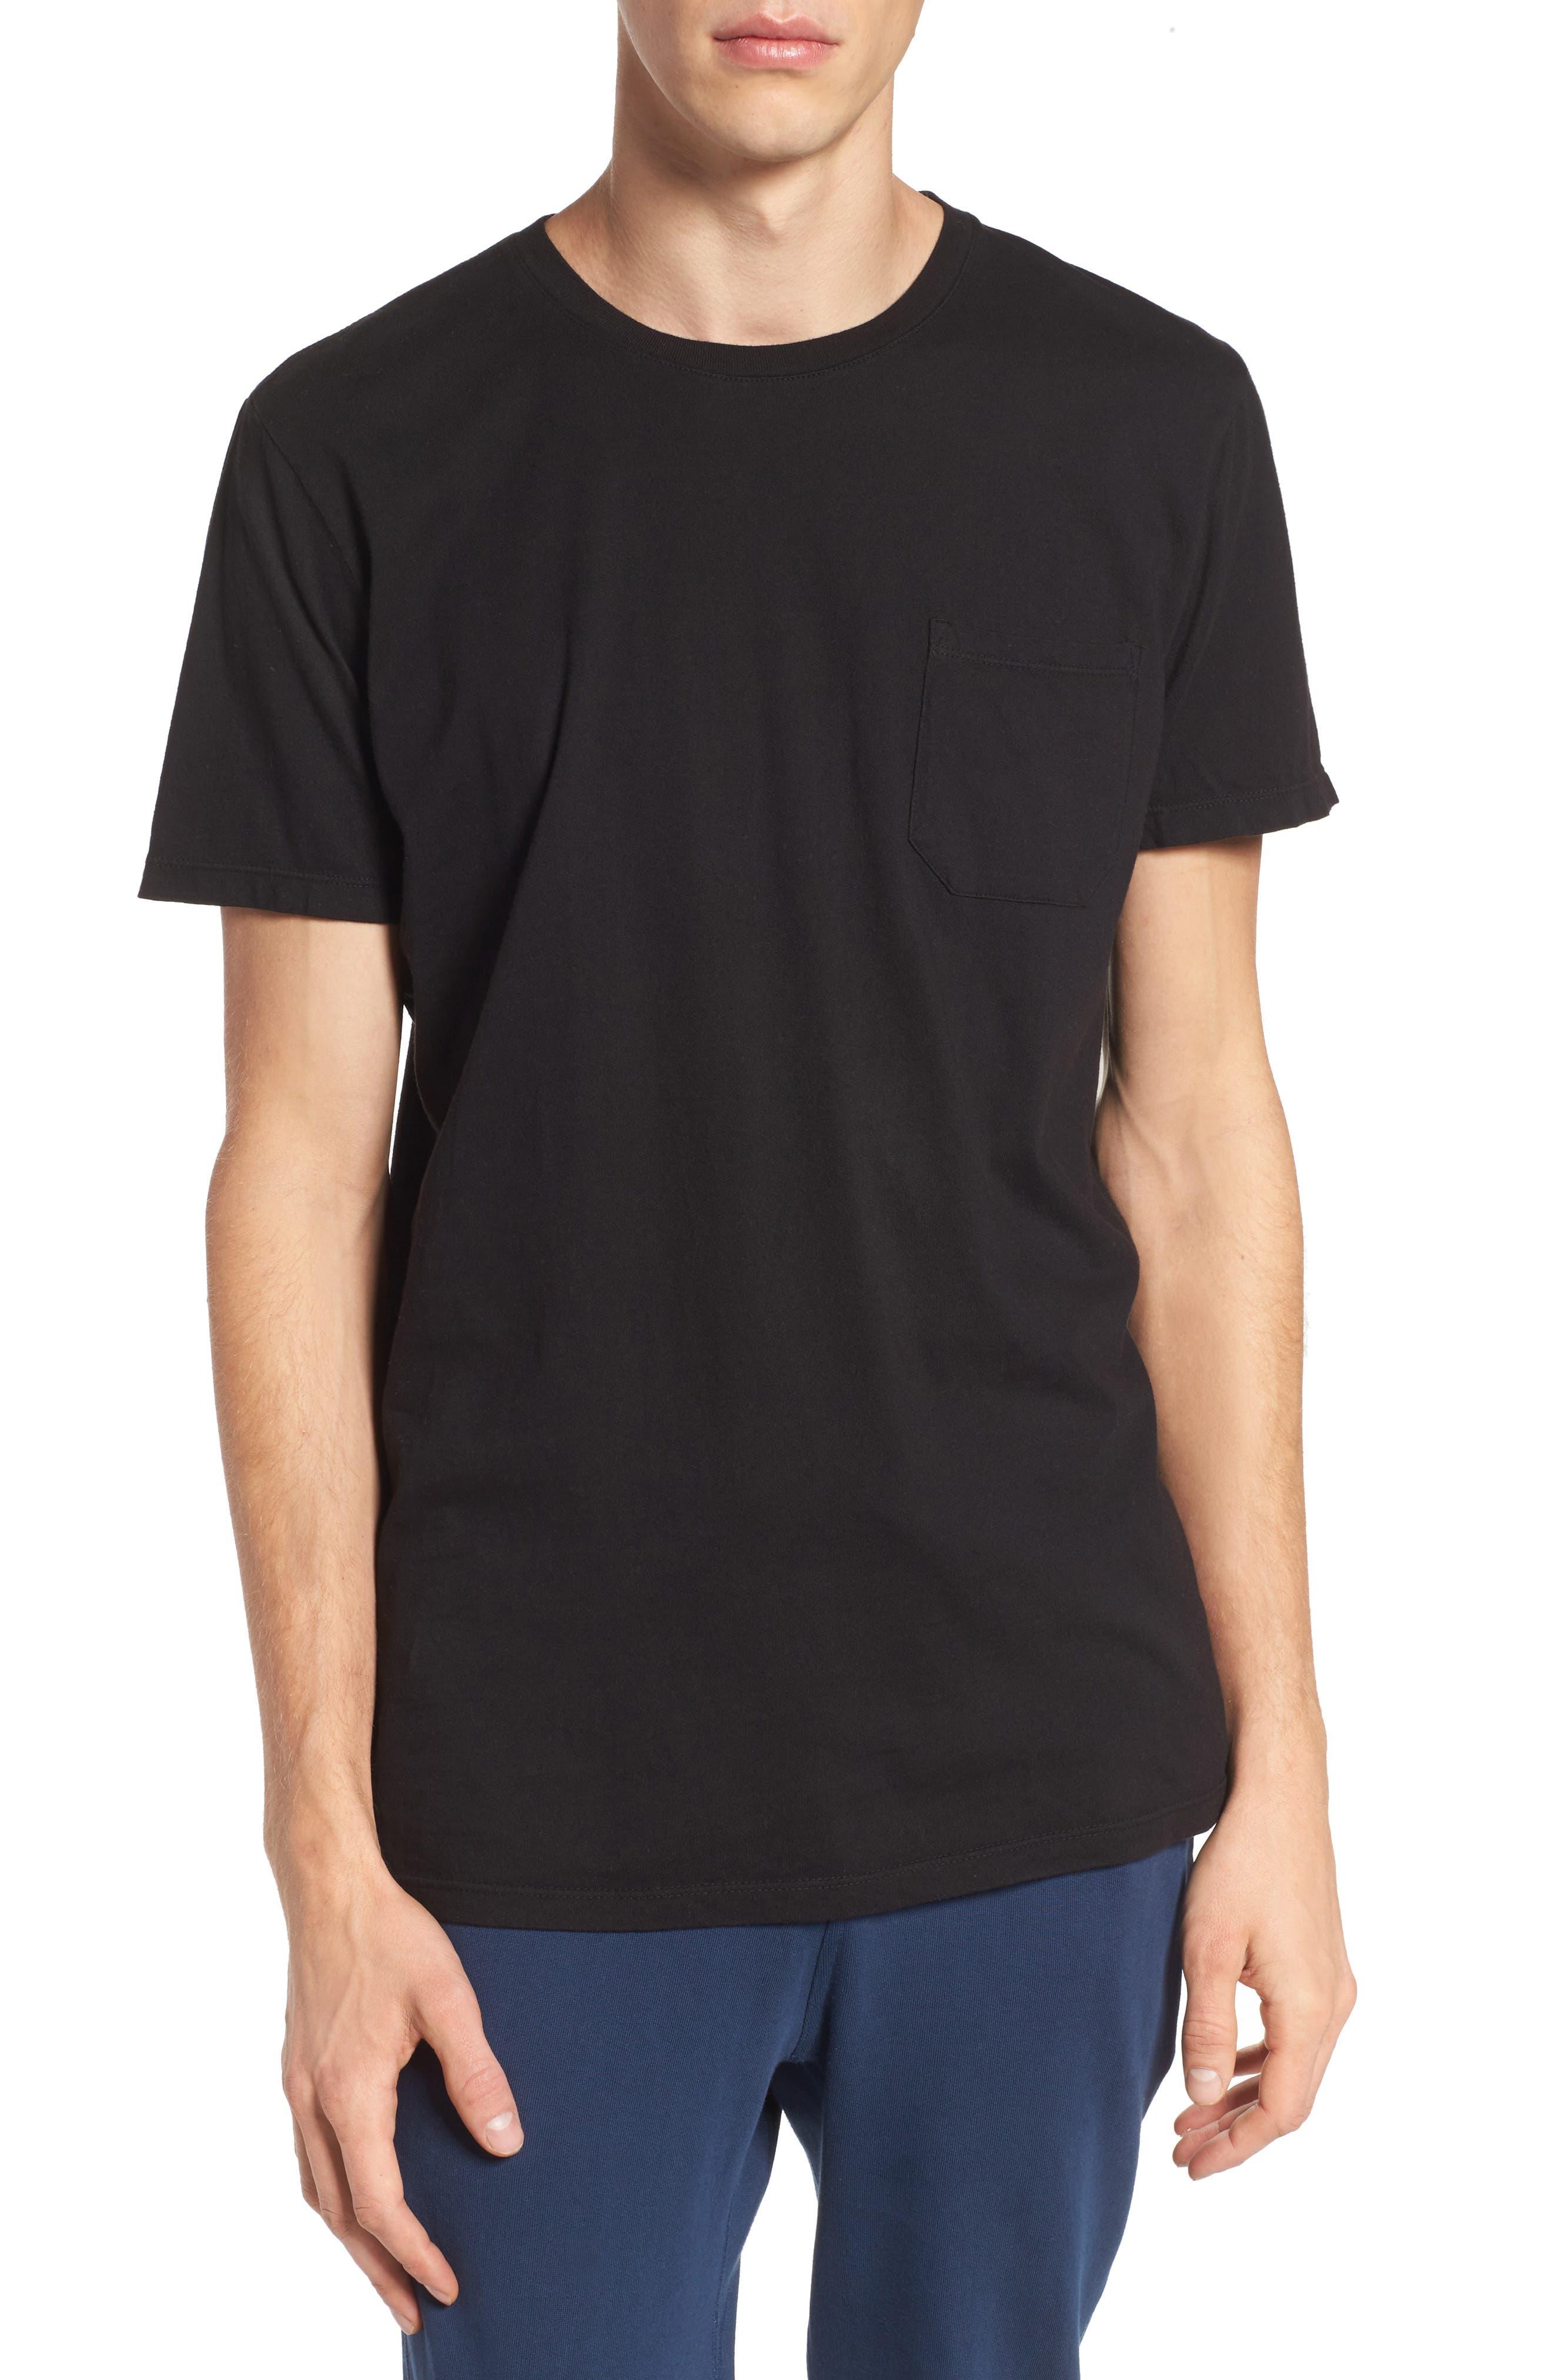 RICHER POORER, Lounge Pocket T-Shirt, Main thumbnail 1, color, BLACK